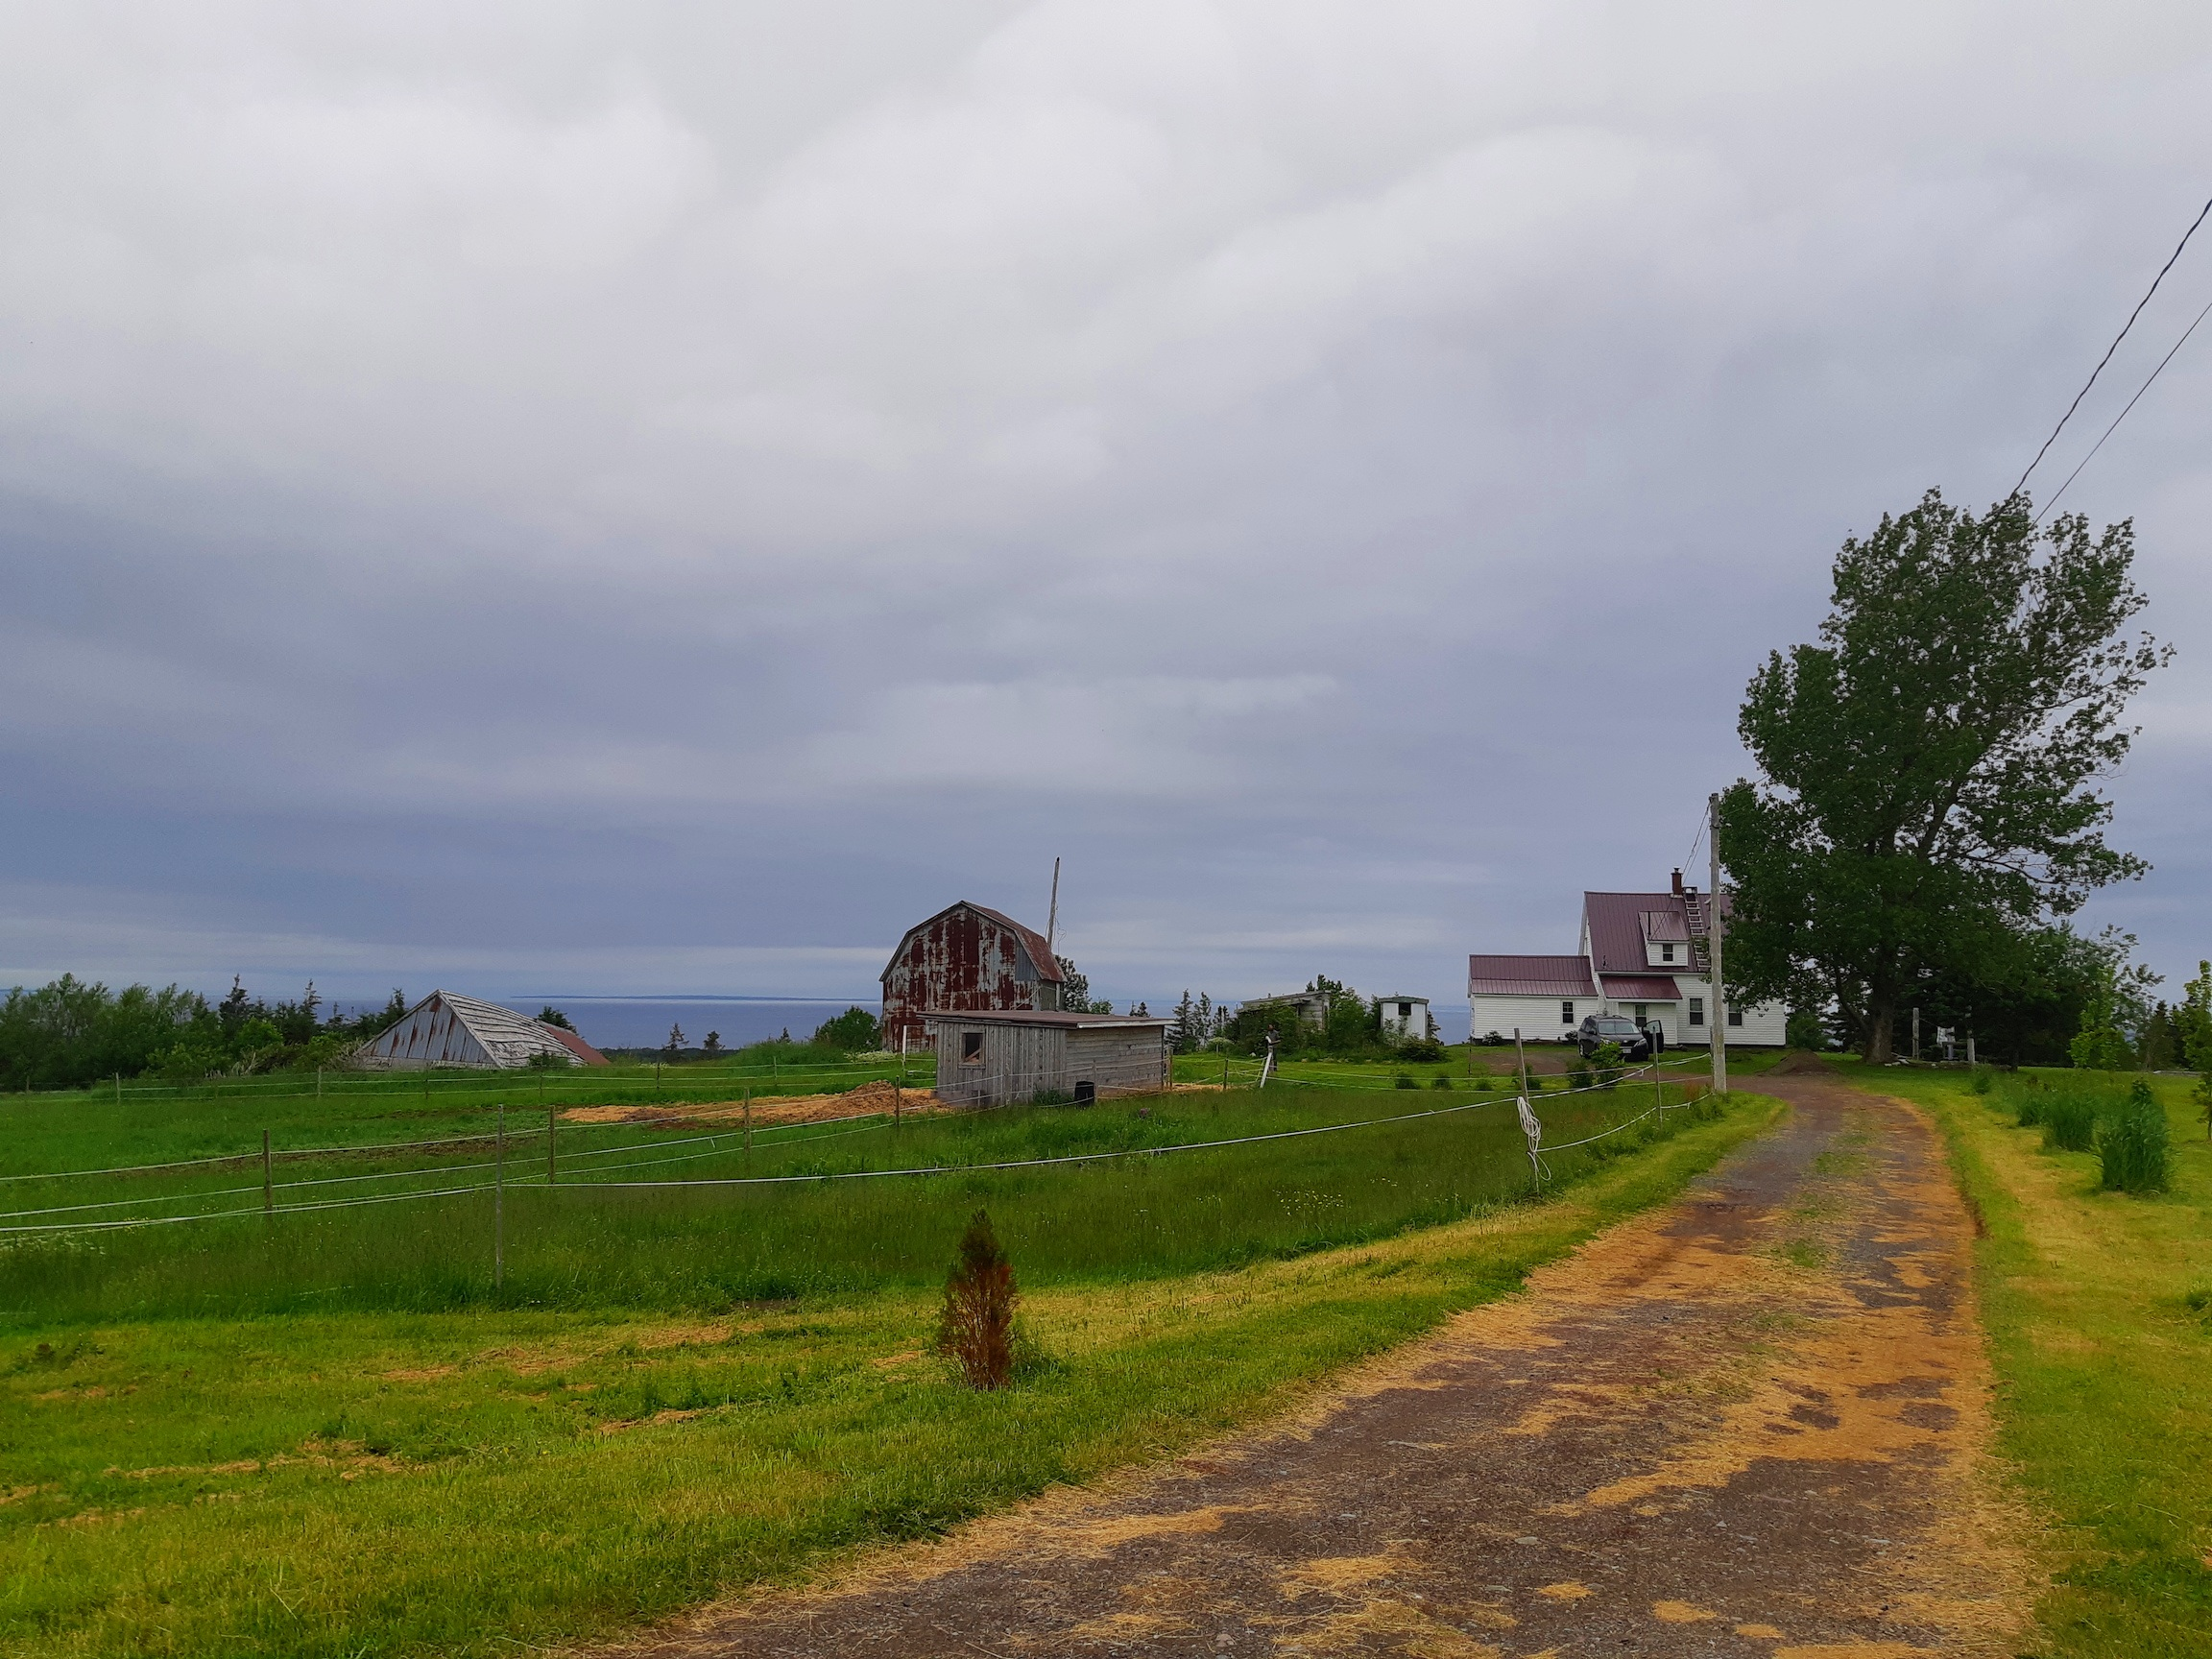 farm+from+road.jpg